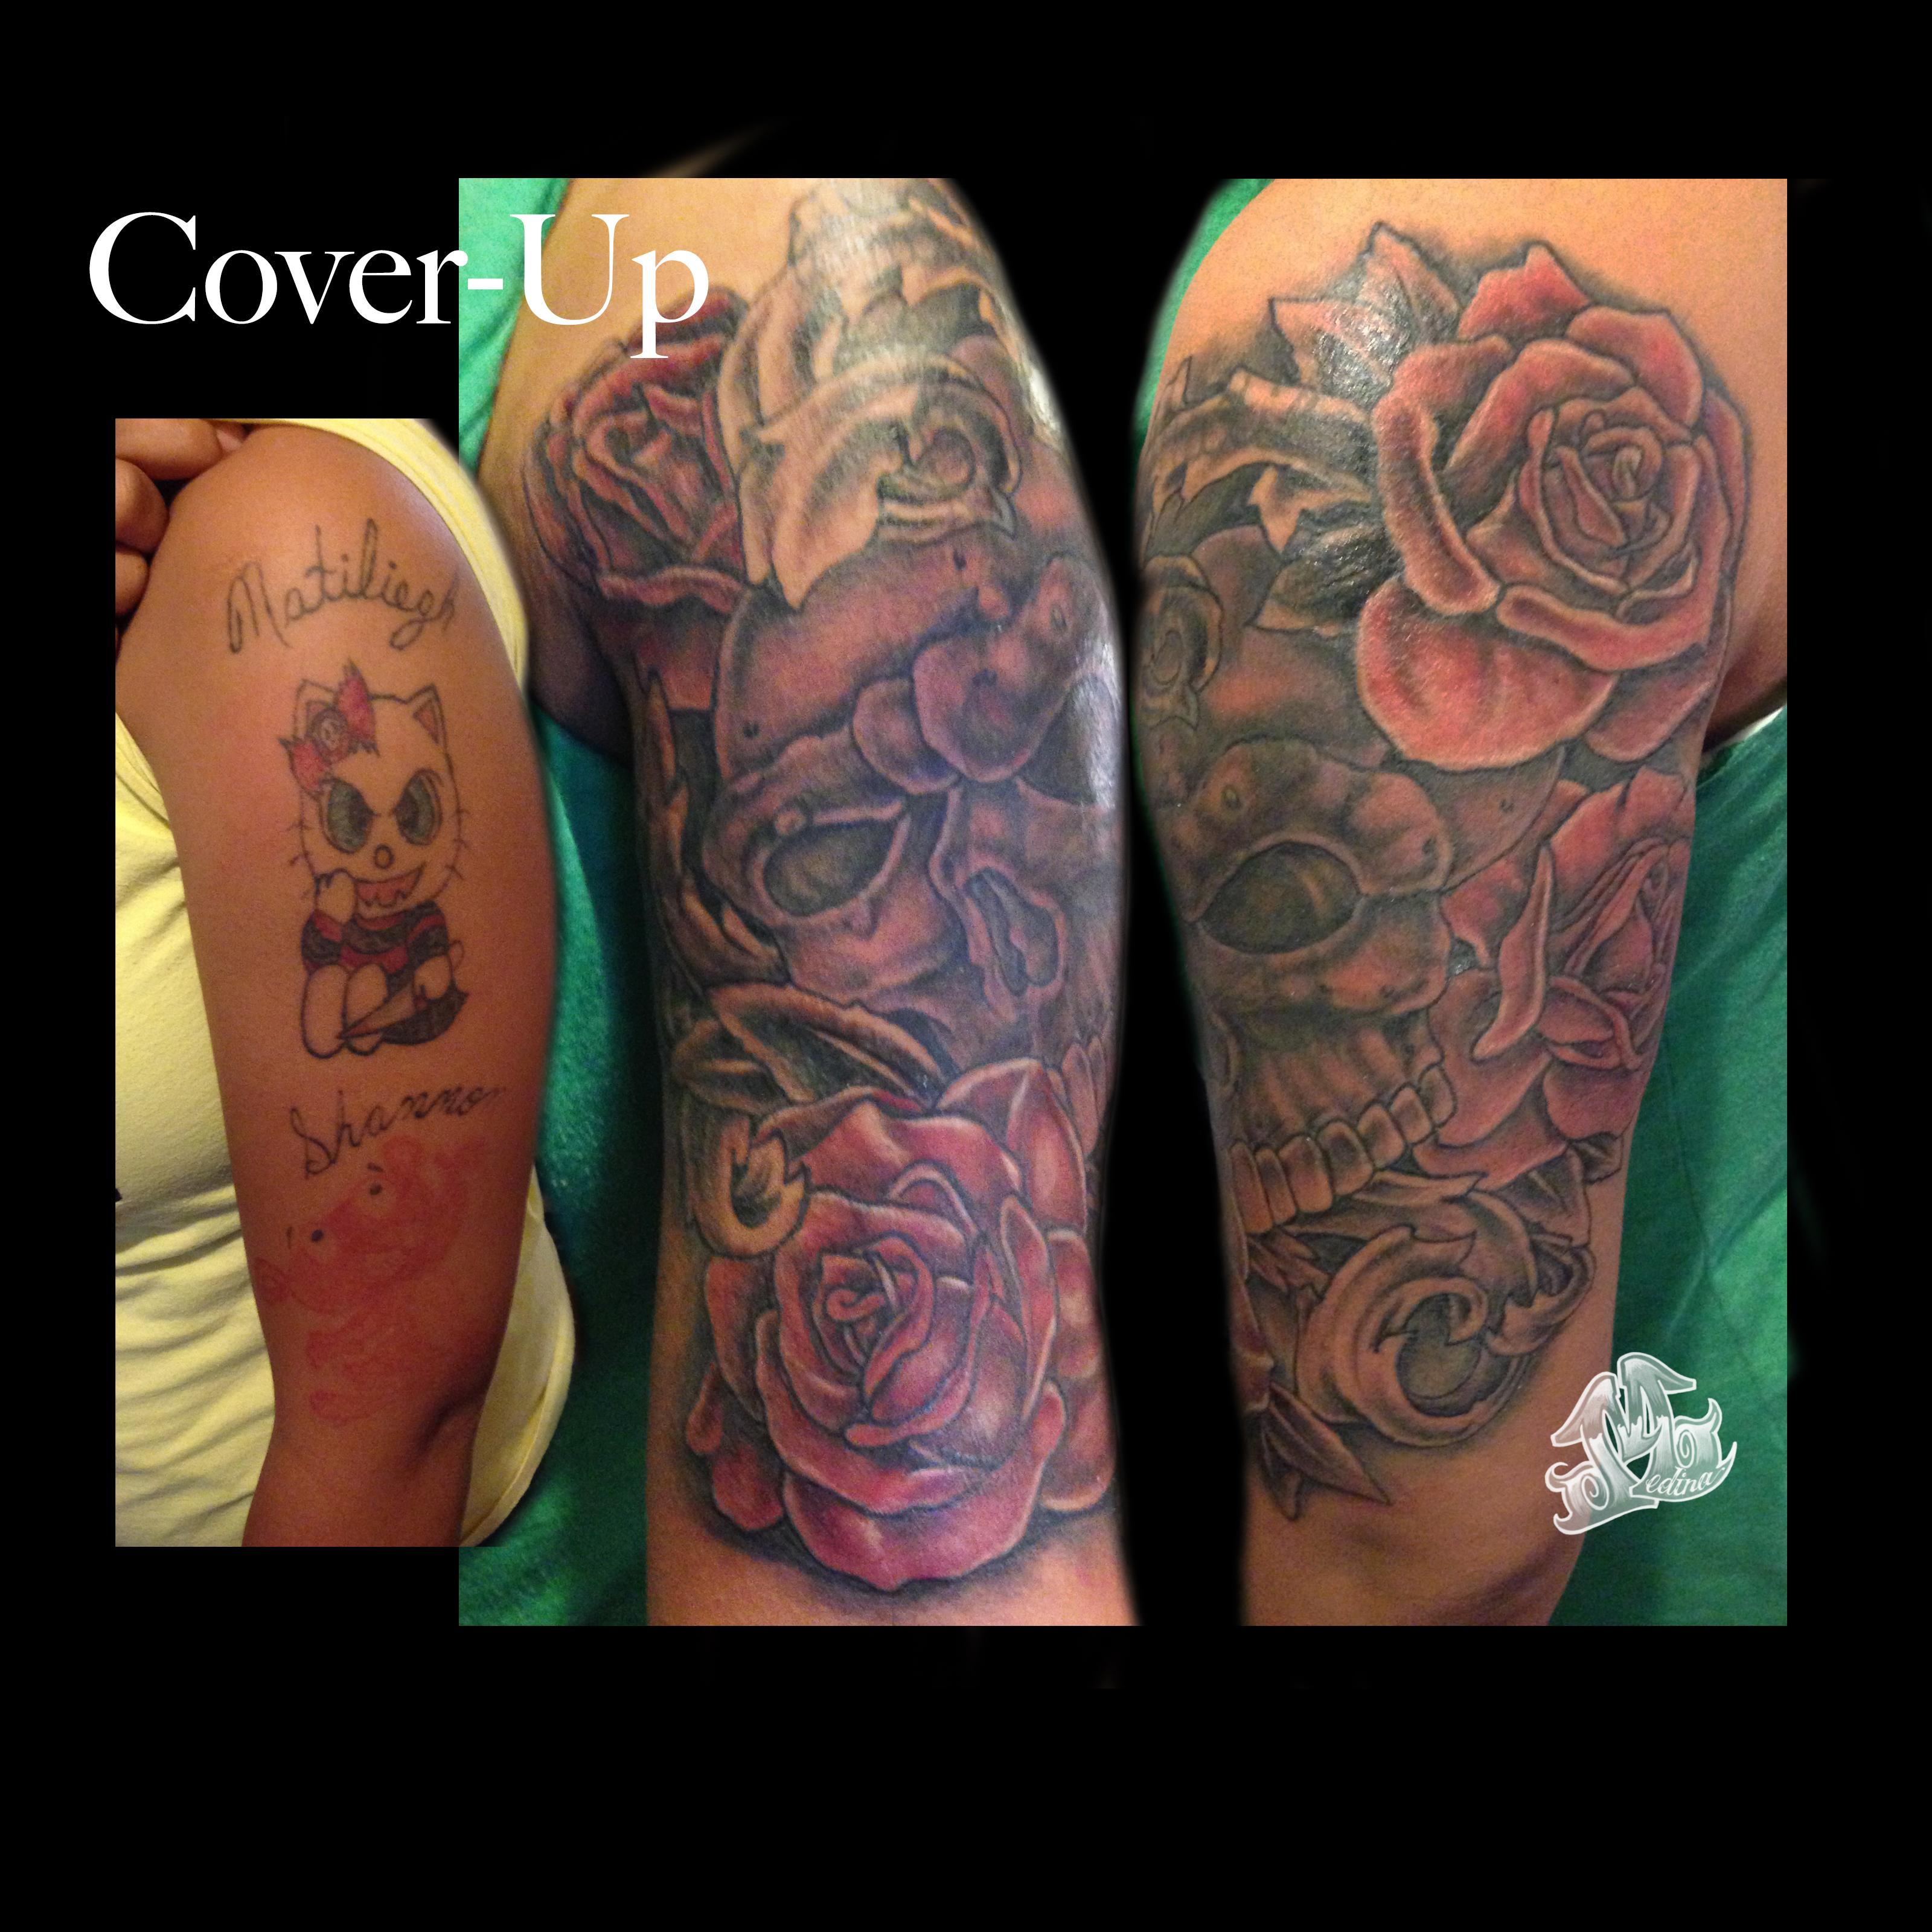 Half sleeve cover up tattoo michael medina art for Tattoo sleeve cover ups